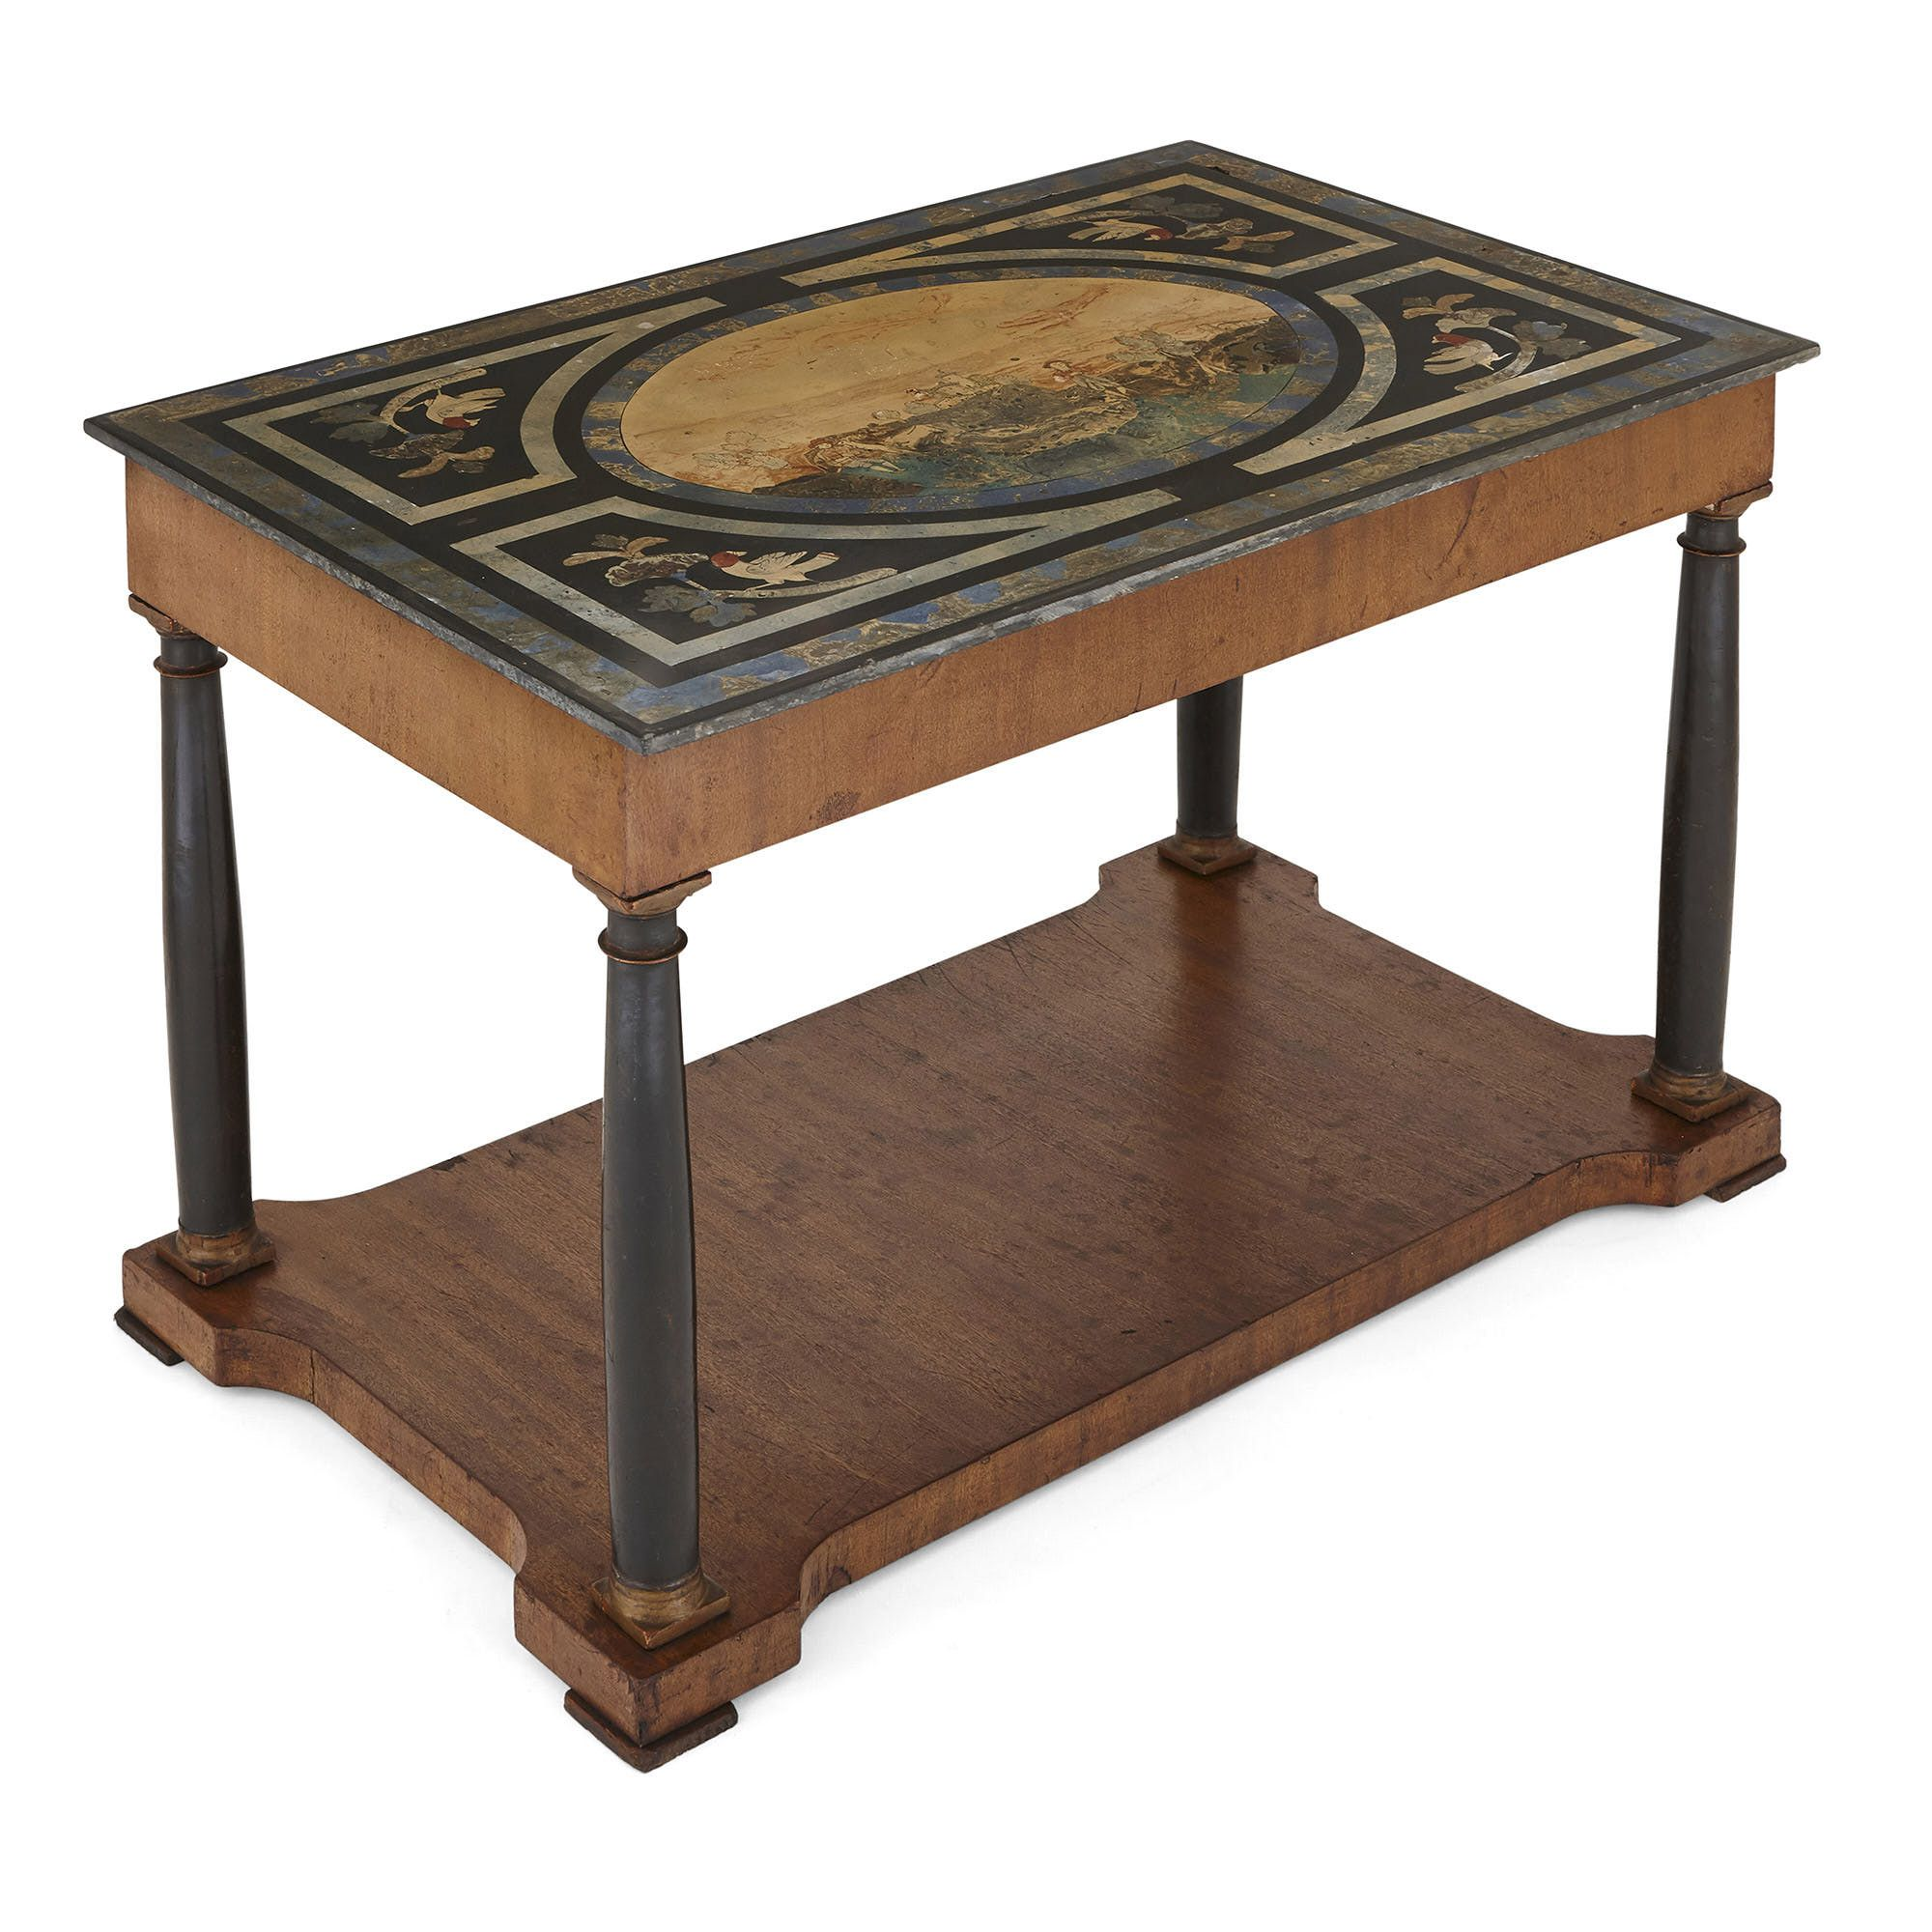 Walnut Coffee Table.Antique Italian Walnut Coffee Table With Scagliola Top